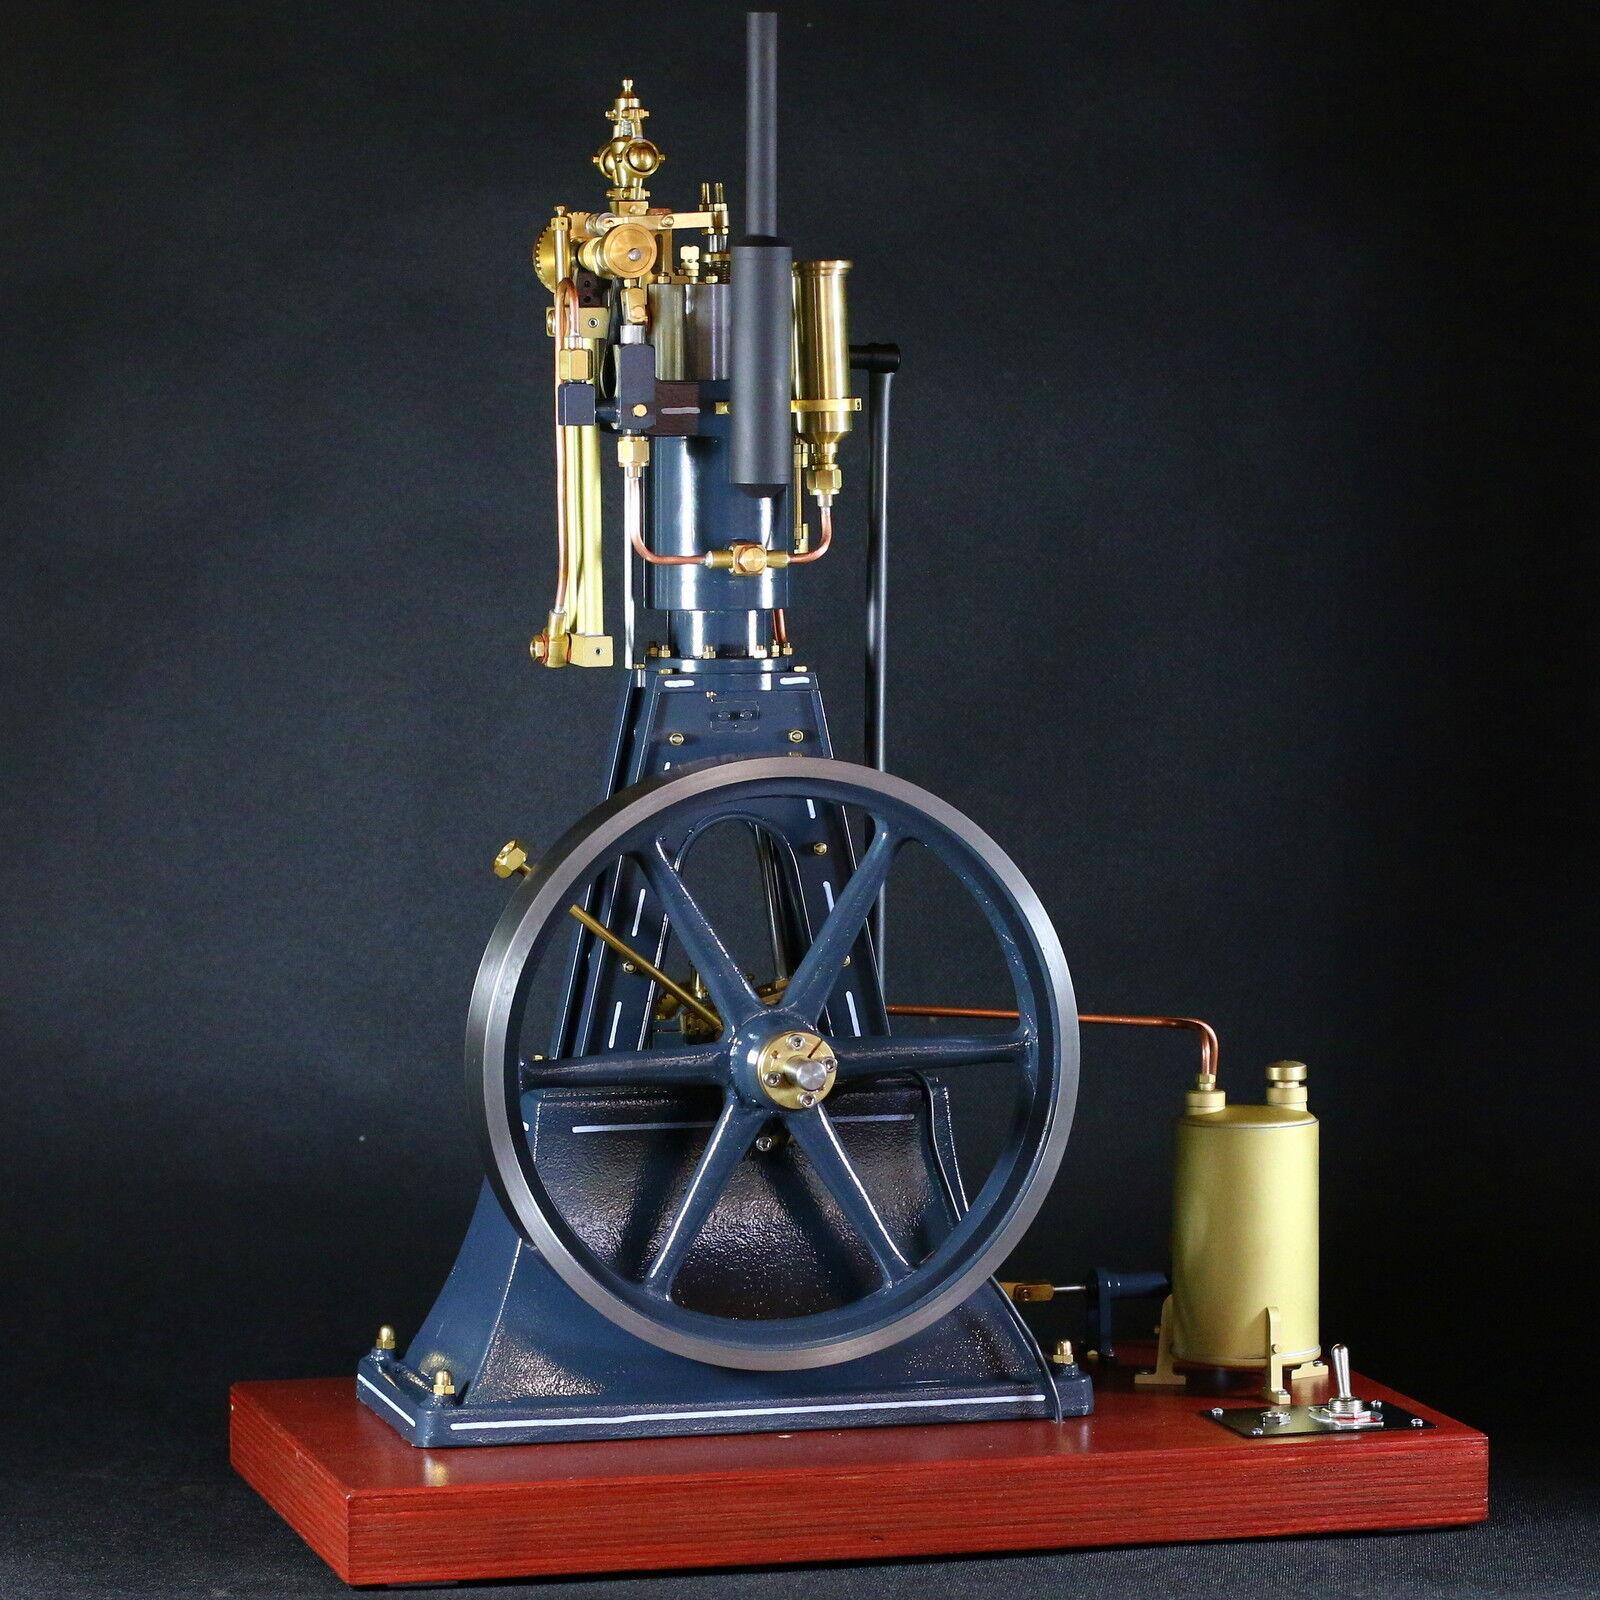 Verticale motore a combustione interna  Jonas  materiale KIT MOTORE stazionario